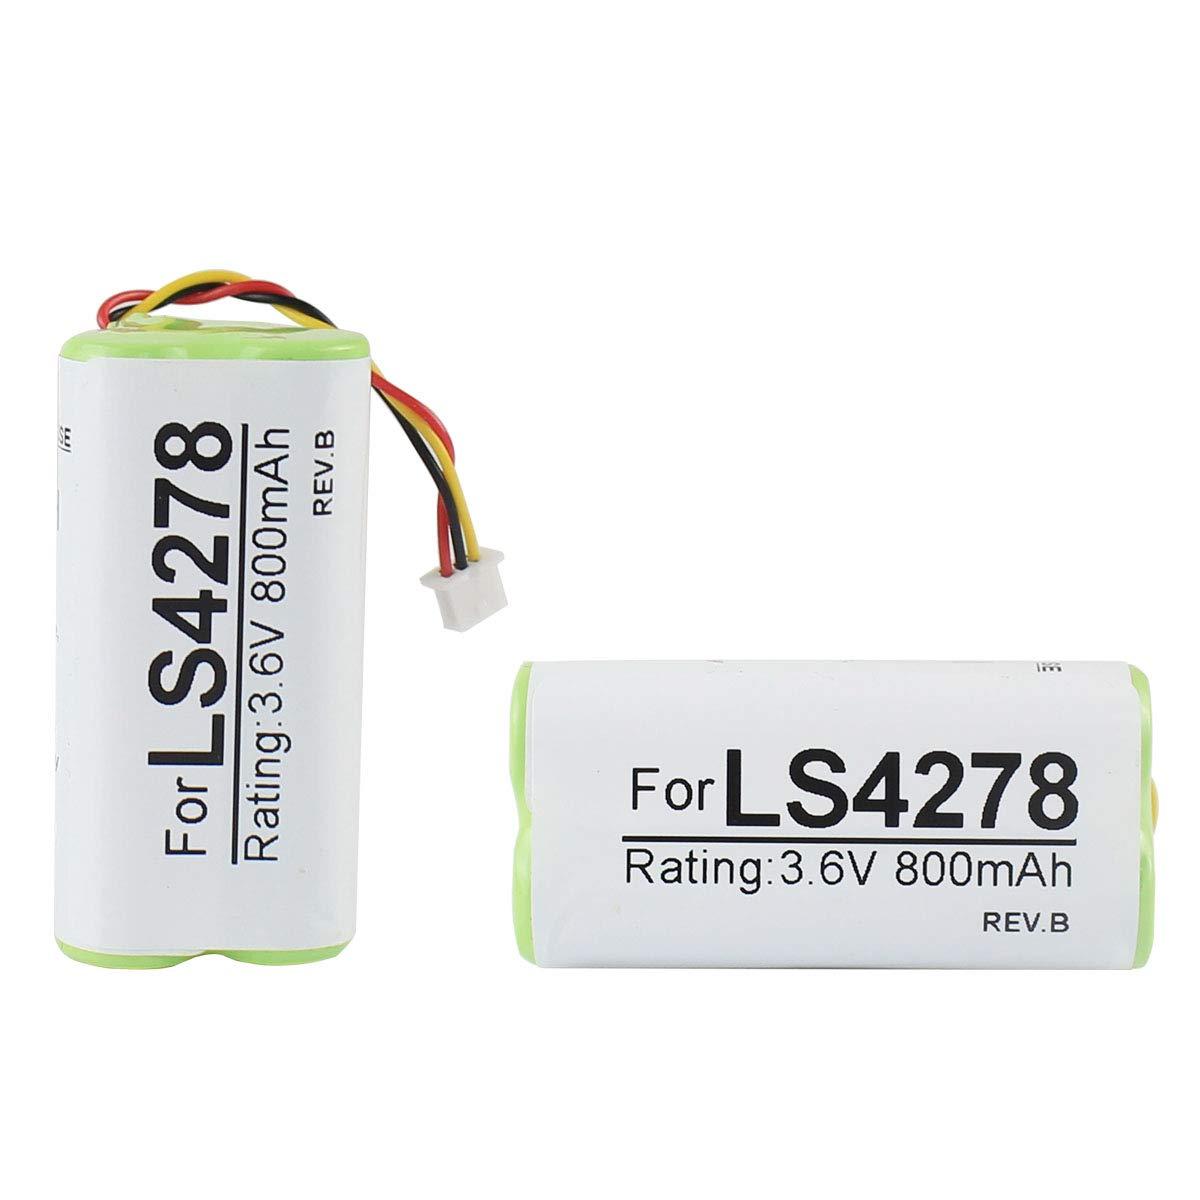 2-Pack Battery for Motorola Symbol LS4278 LS4278-M LI4278 DS6878 Barcode Scanner 800mAh 3.6V Ni-Mh PN 82-67705-01 BTRY-LS42RAAOE-01 Partshe